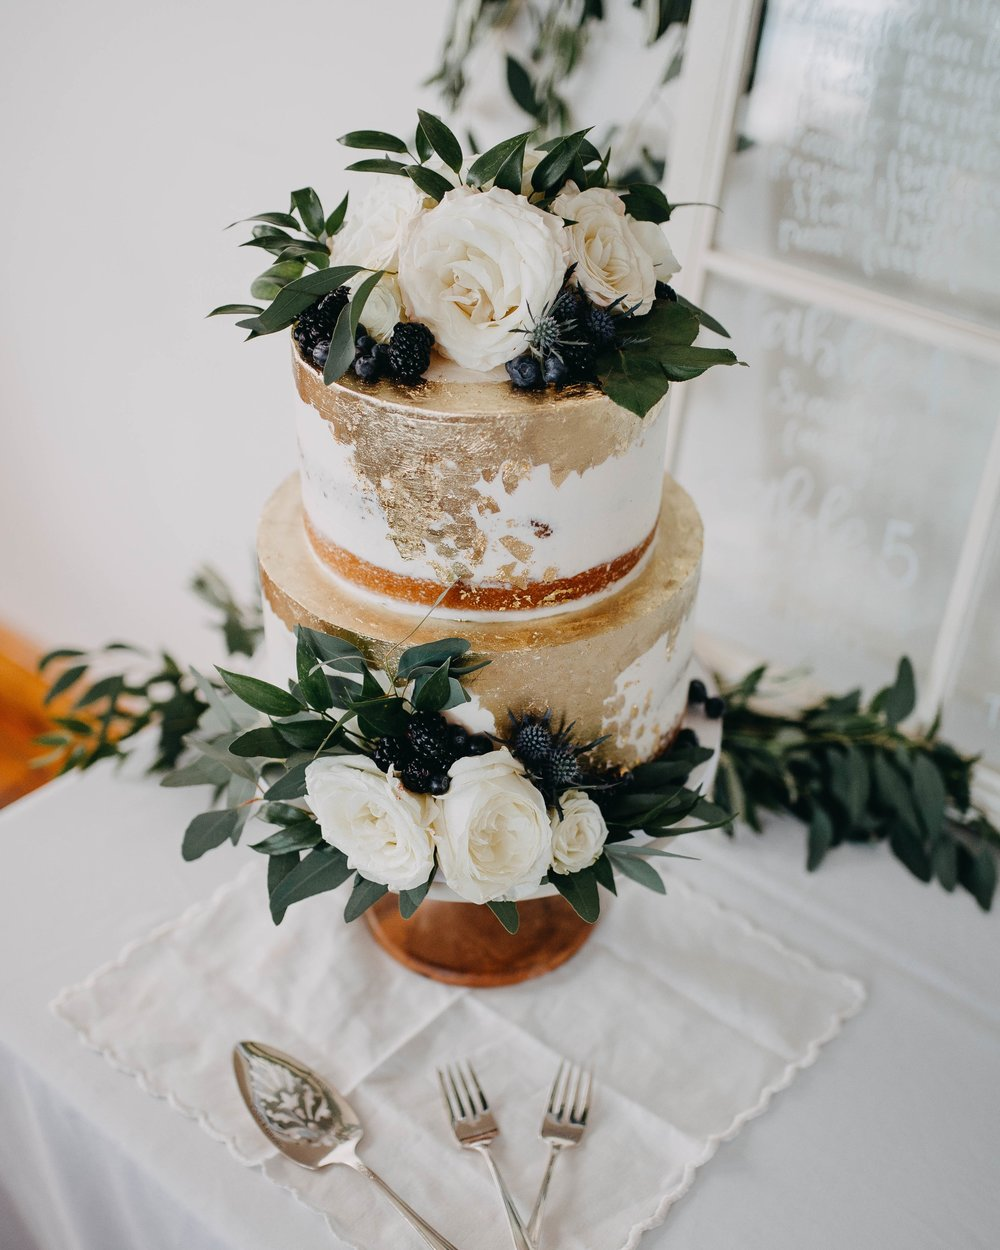 Blue thistle Cakes -